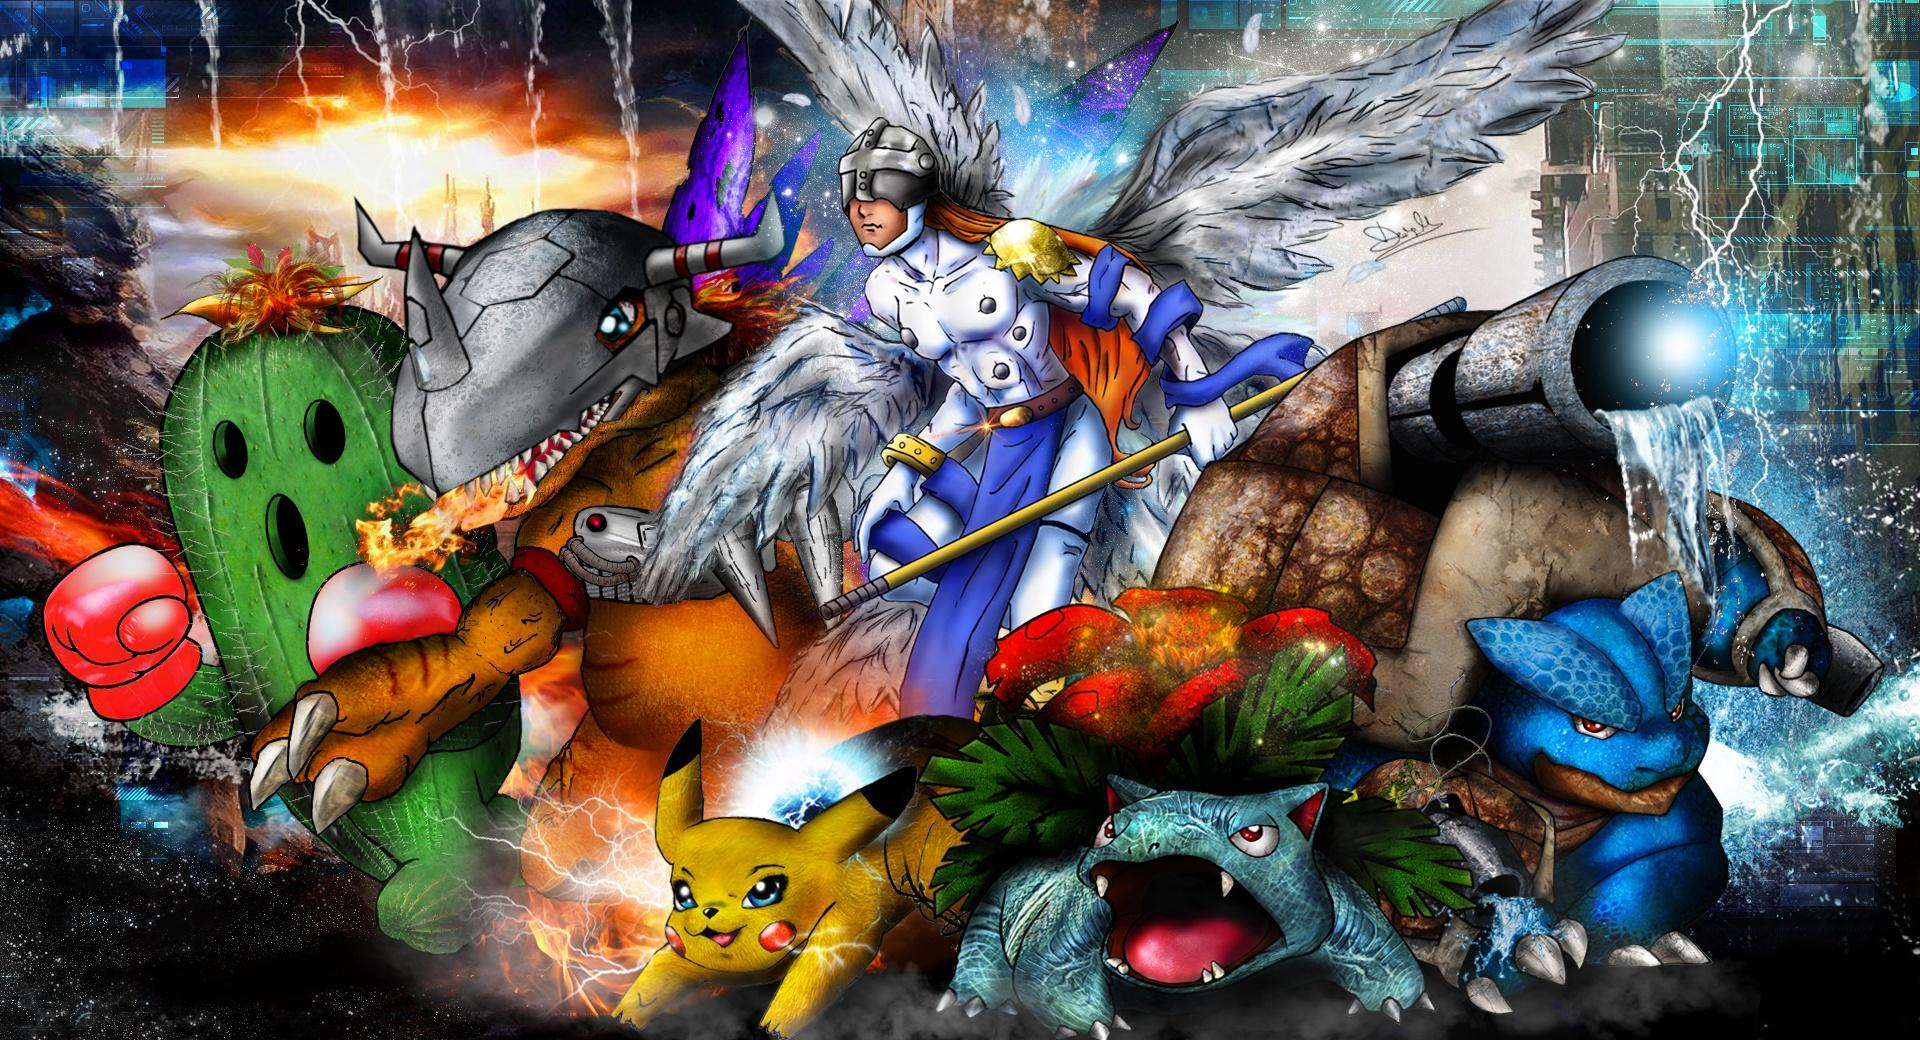 Digimon x Pokemon Mash Up 2014 wallpapers HD quality